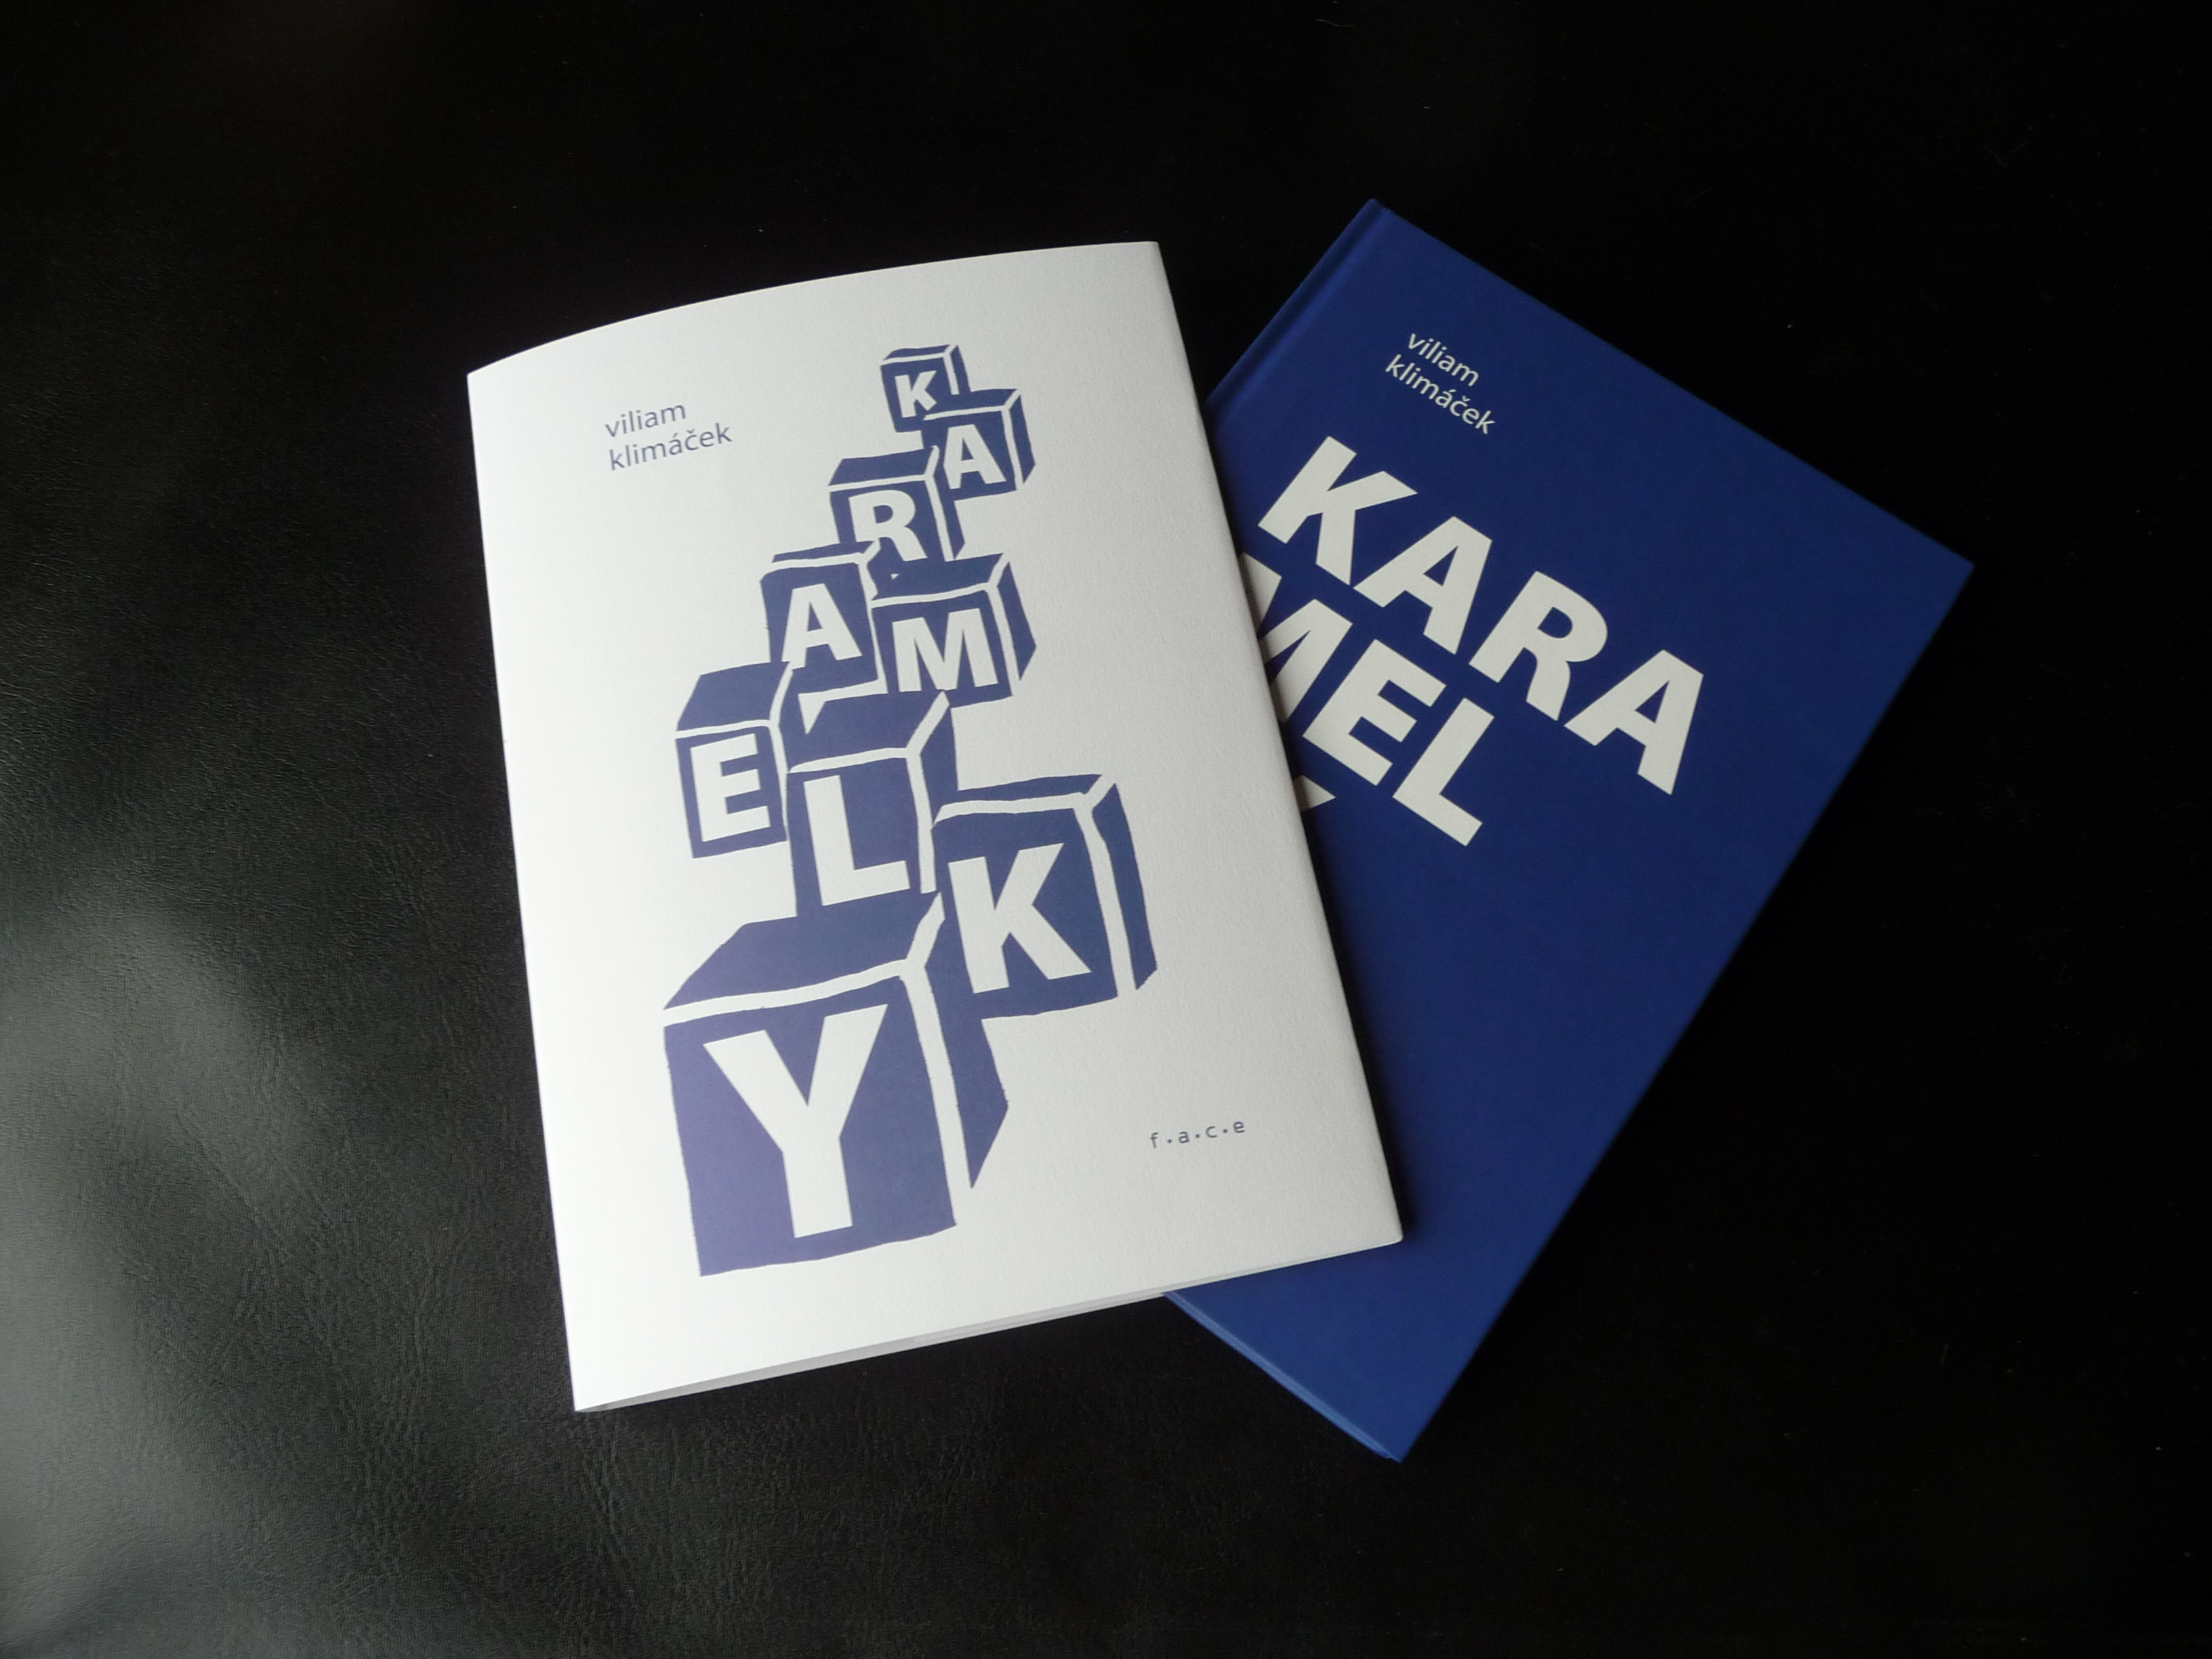 Viliam Klimáček Karamelky, redesign of Aleš Votava layout, 1993-2016